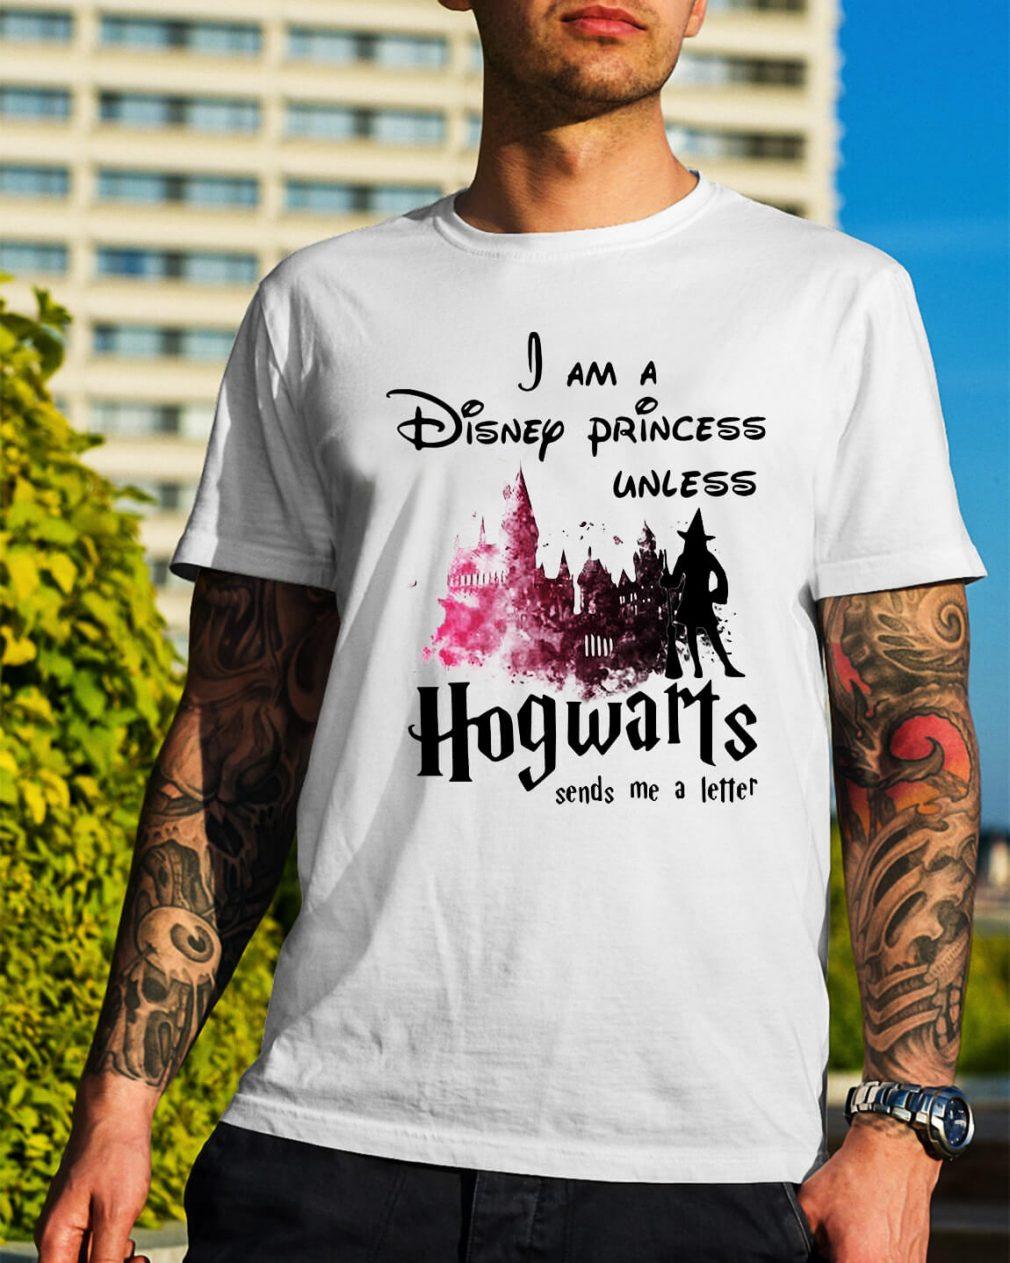 Harry Potter I am Disney princess unless Hogwarts sends me a letter shirt